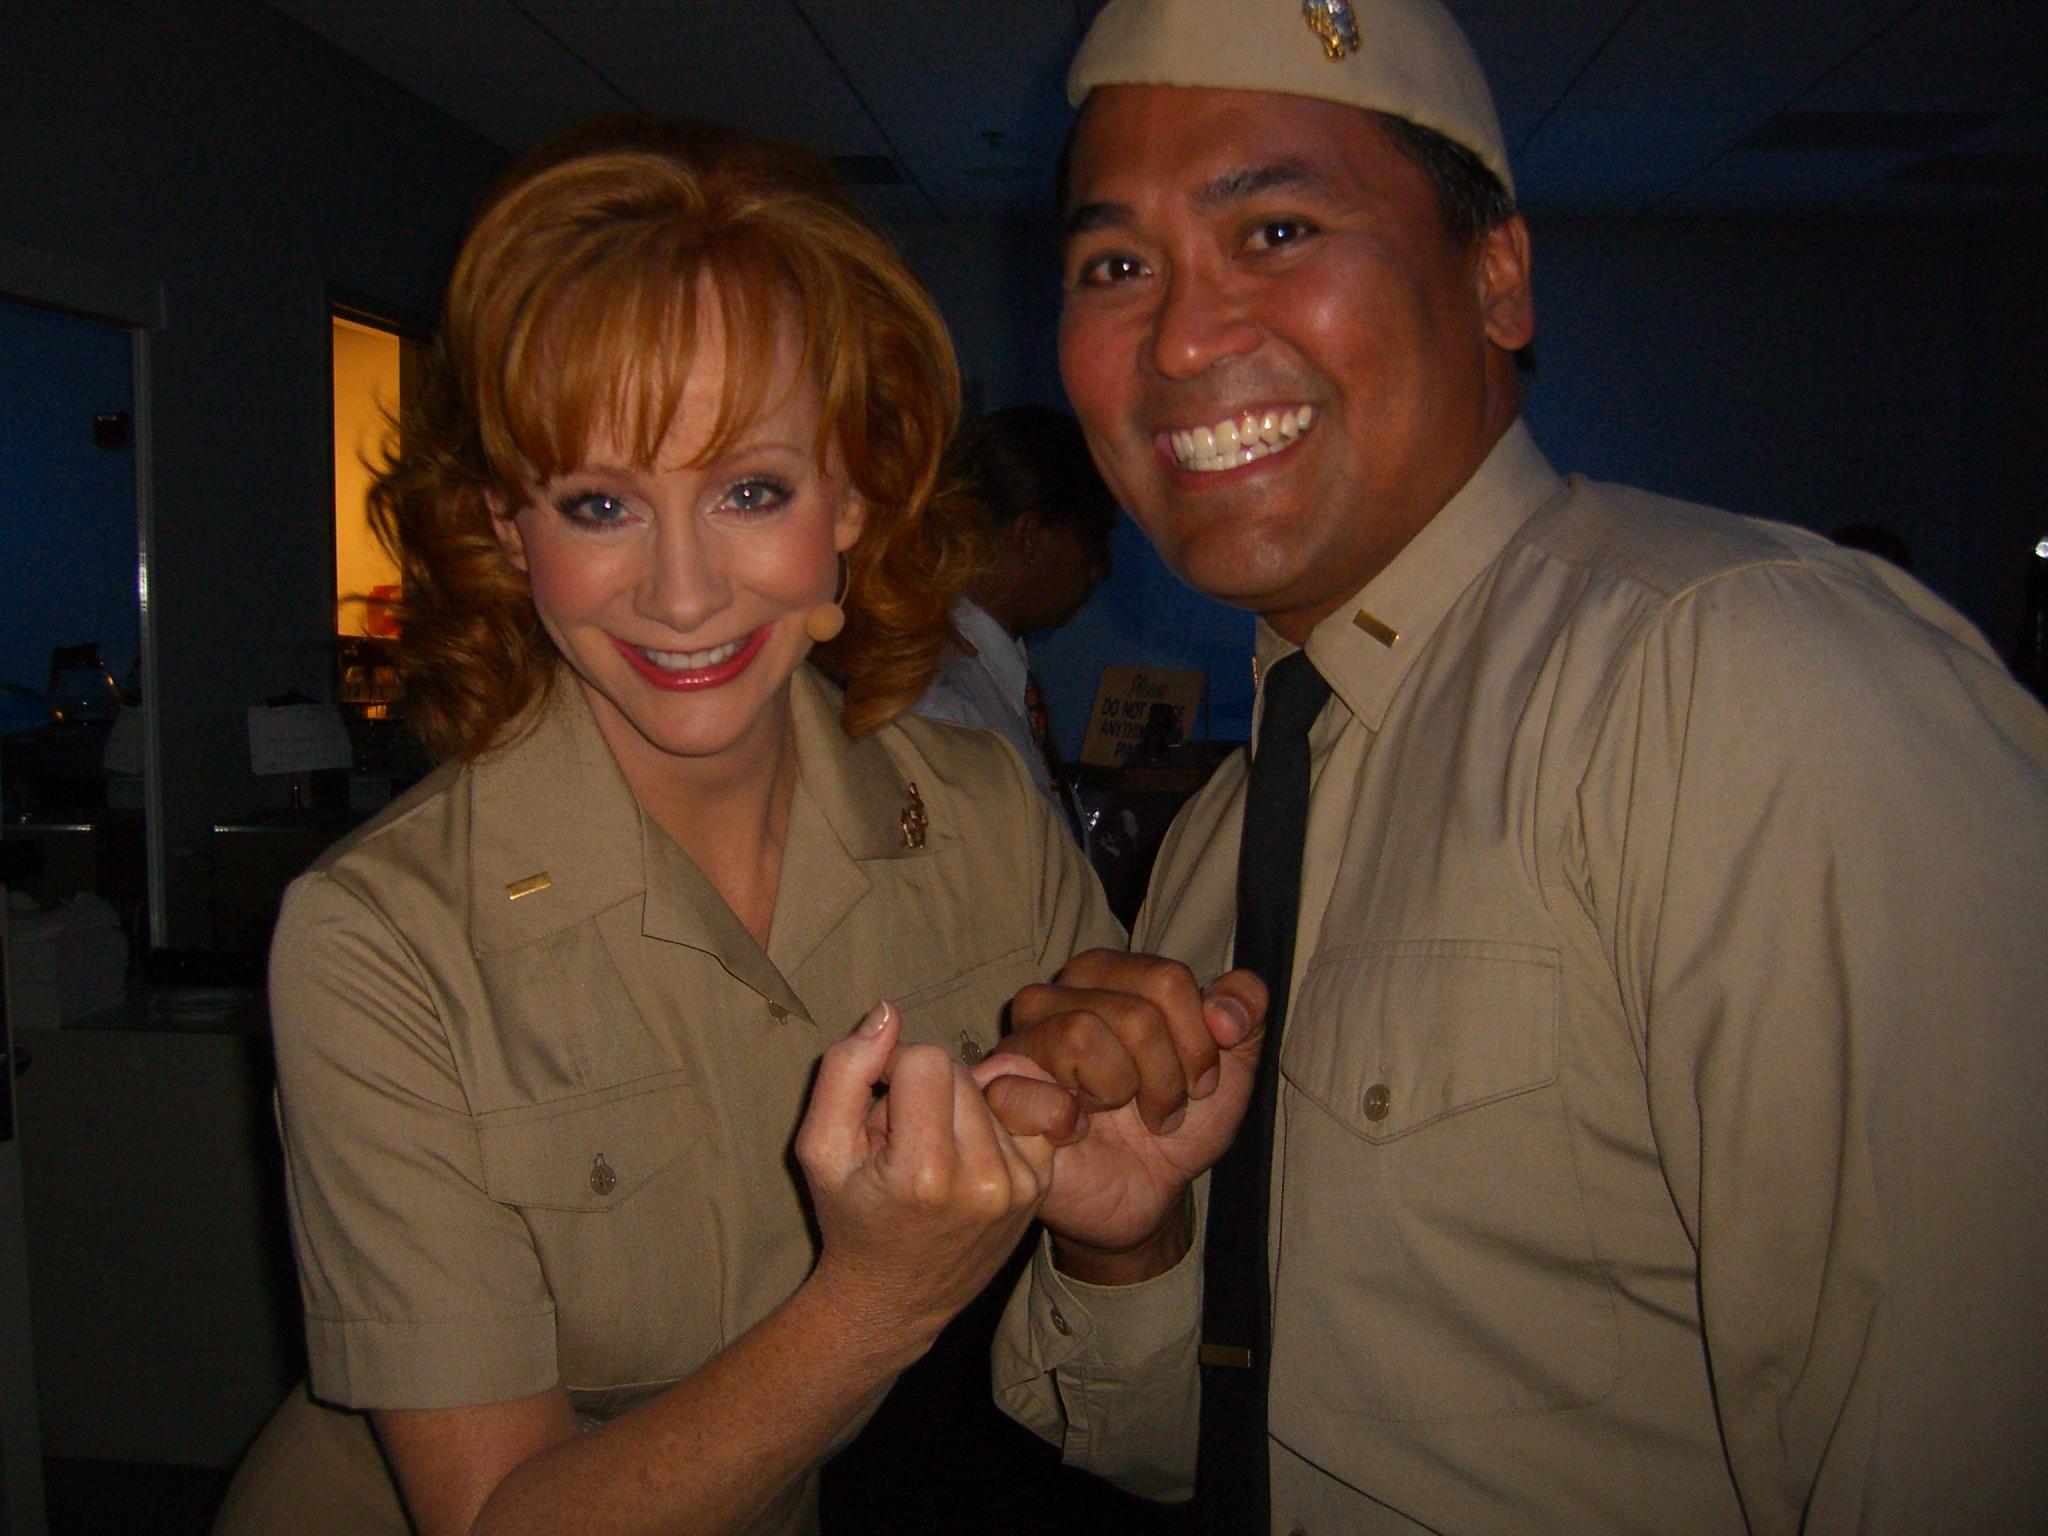 Ricky and Reba McEntire